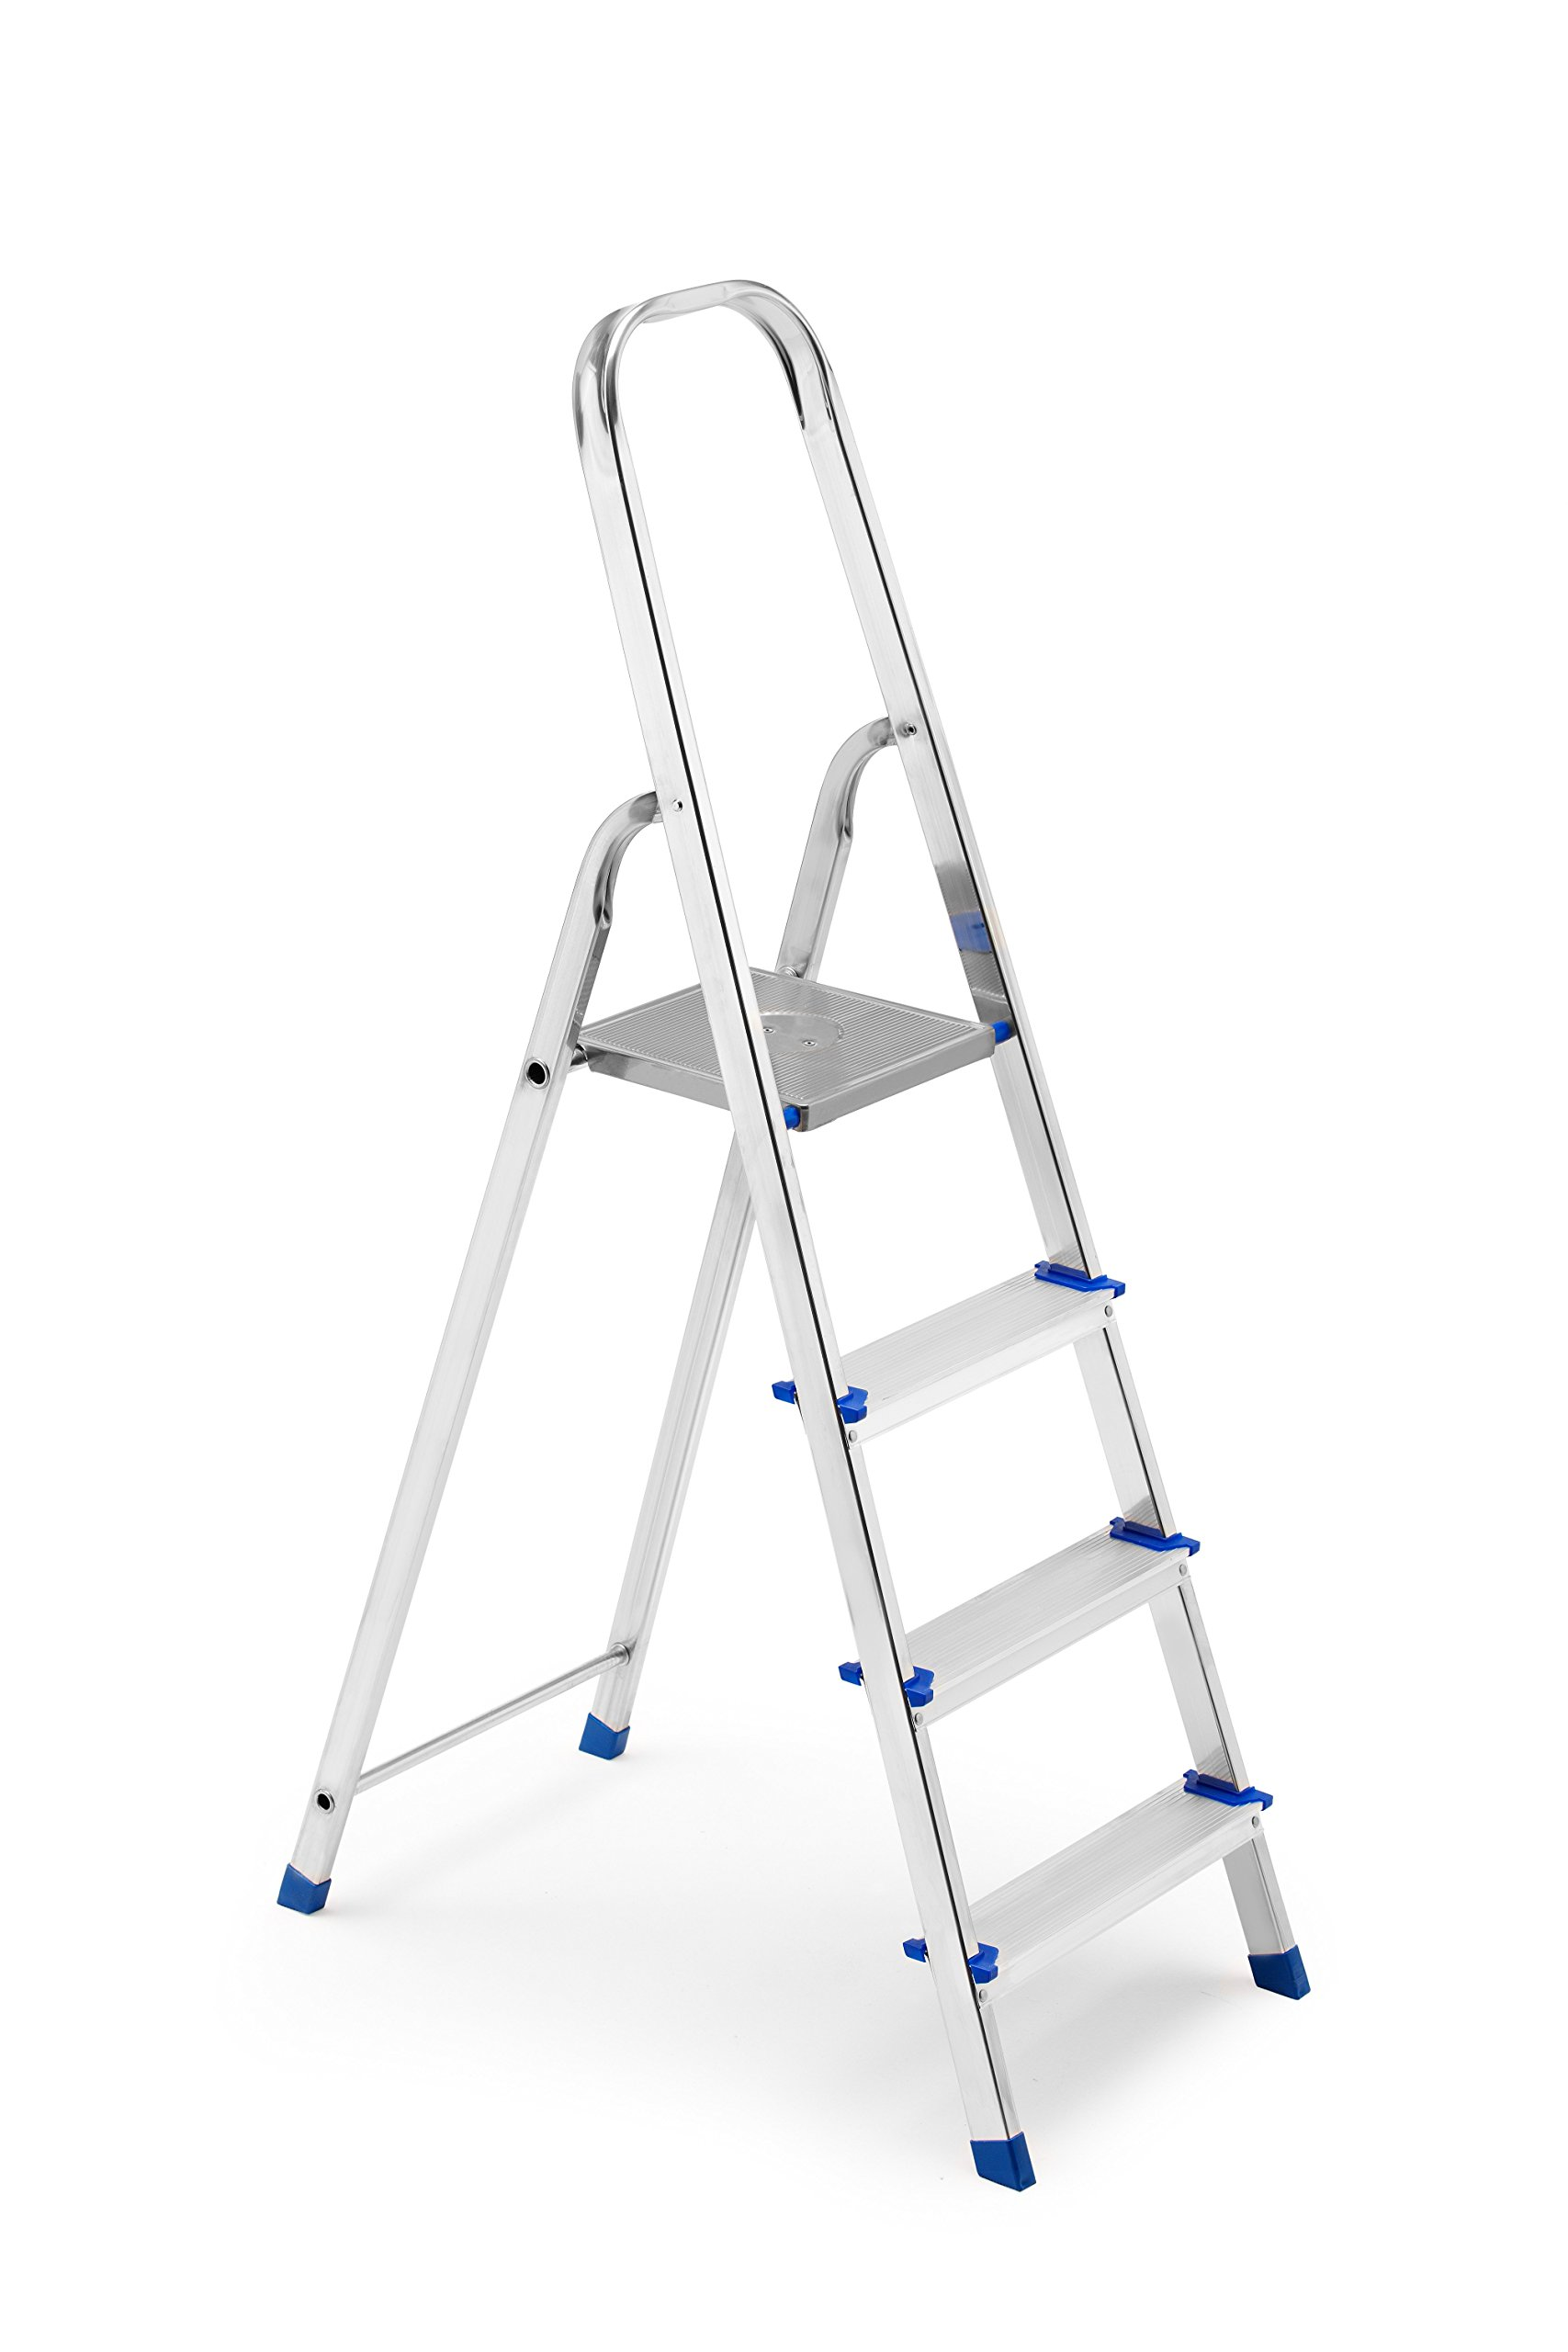 FRAMAR Europiuma 4 Escalera doméstica de Aluminio, 4 Peldaños: Amazon.es: Hogar